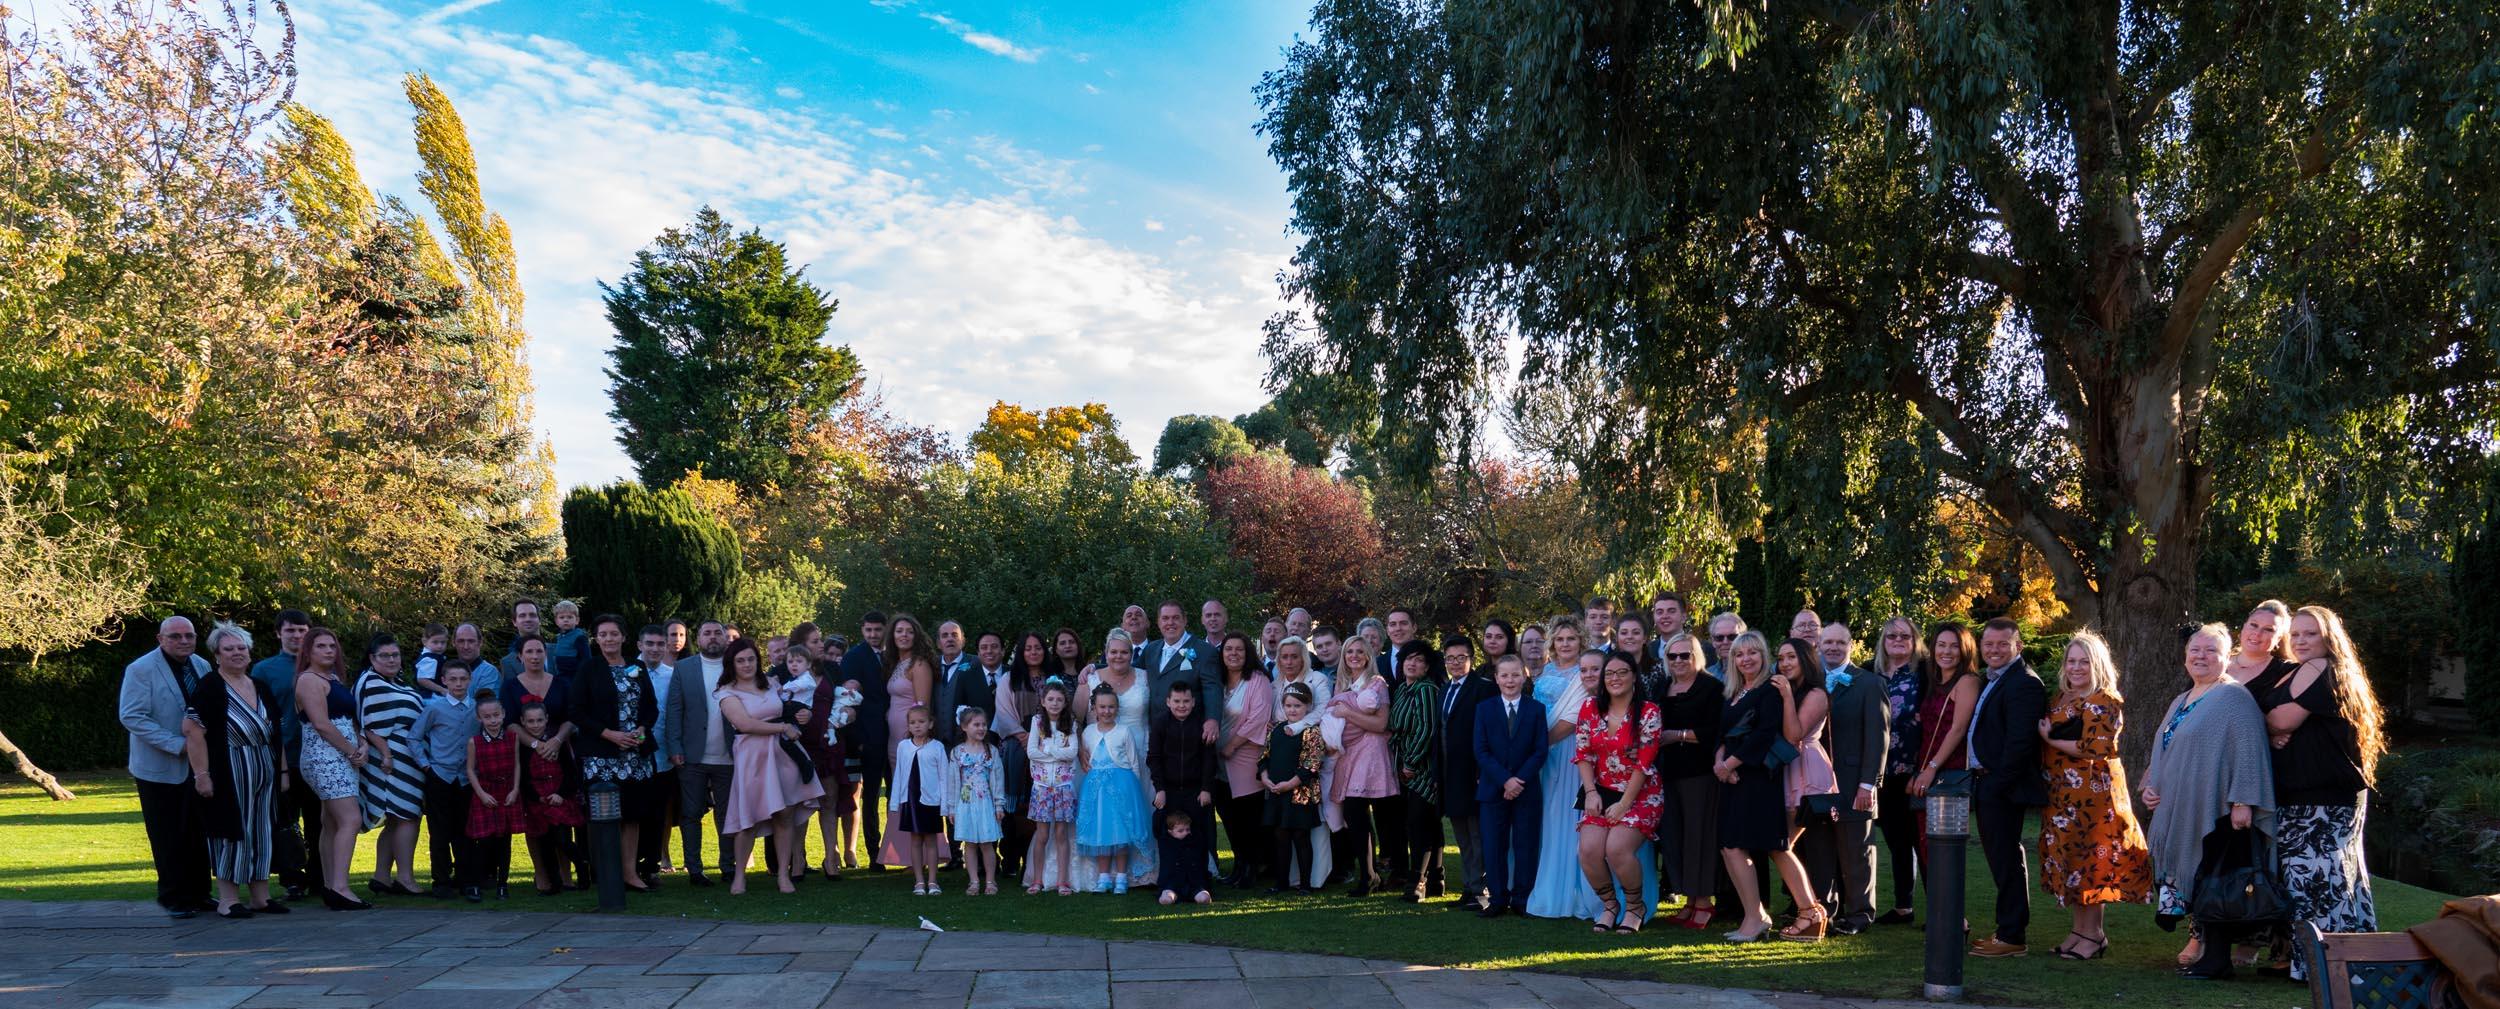 Ye Olde Plough House group wedding shot